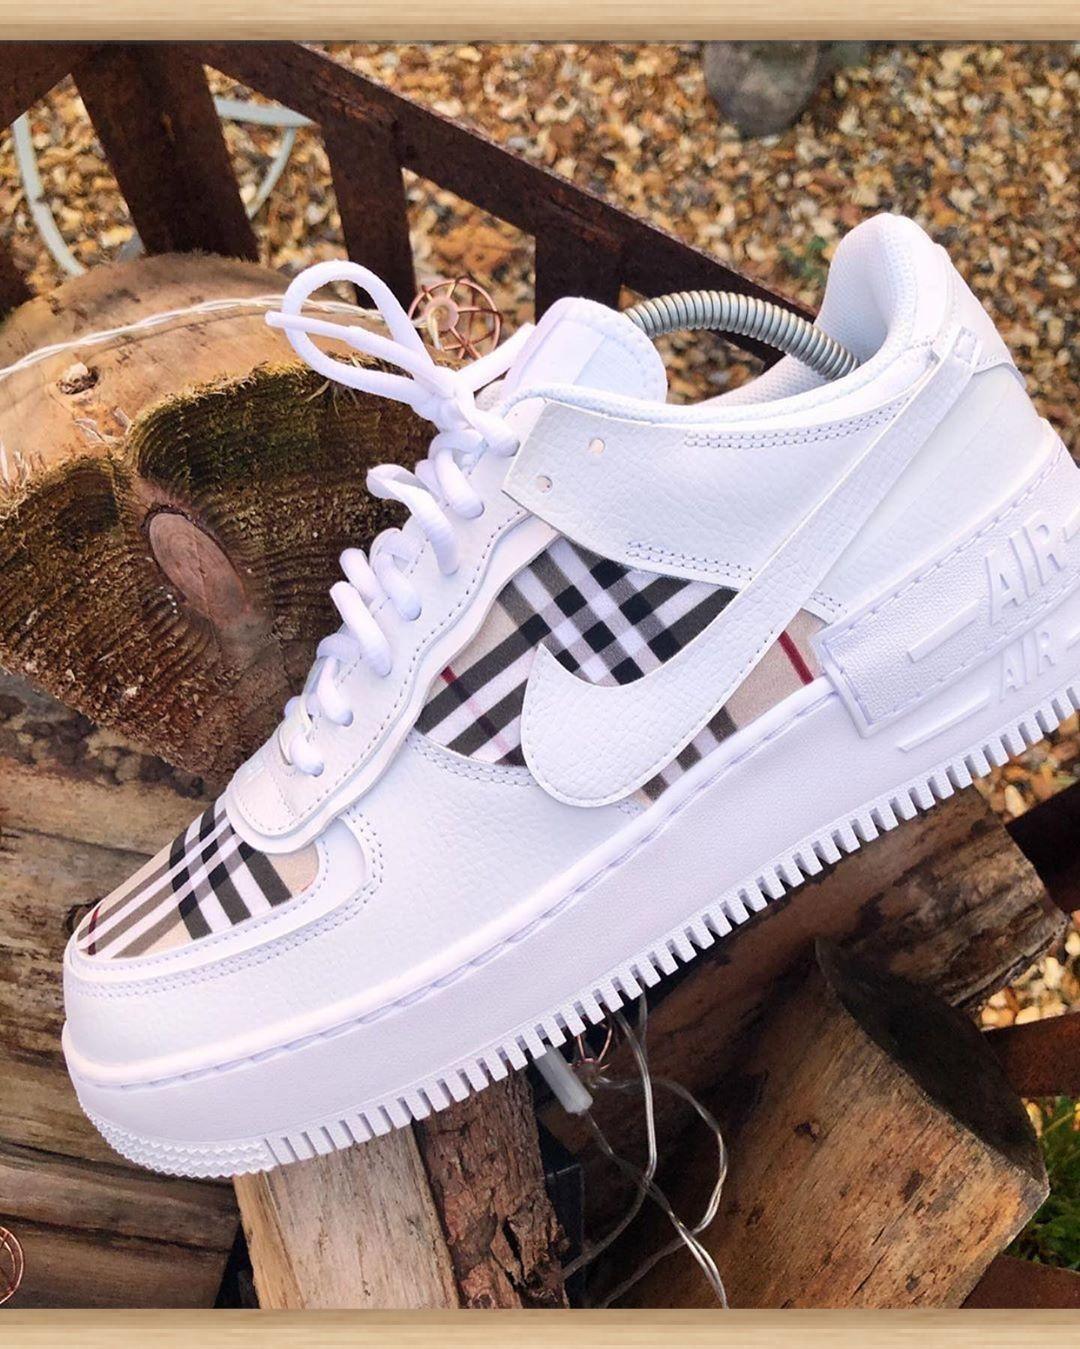 12 idee su Nike Air force 1 | scarpe, scarpe nike, scarpe di moda